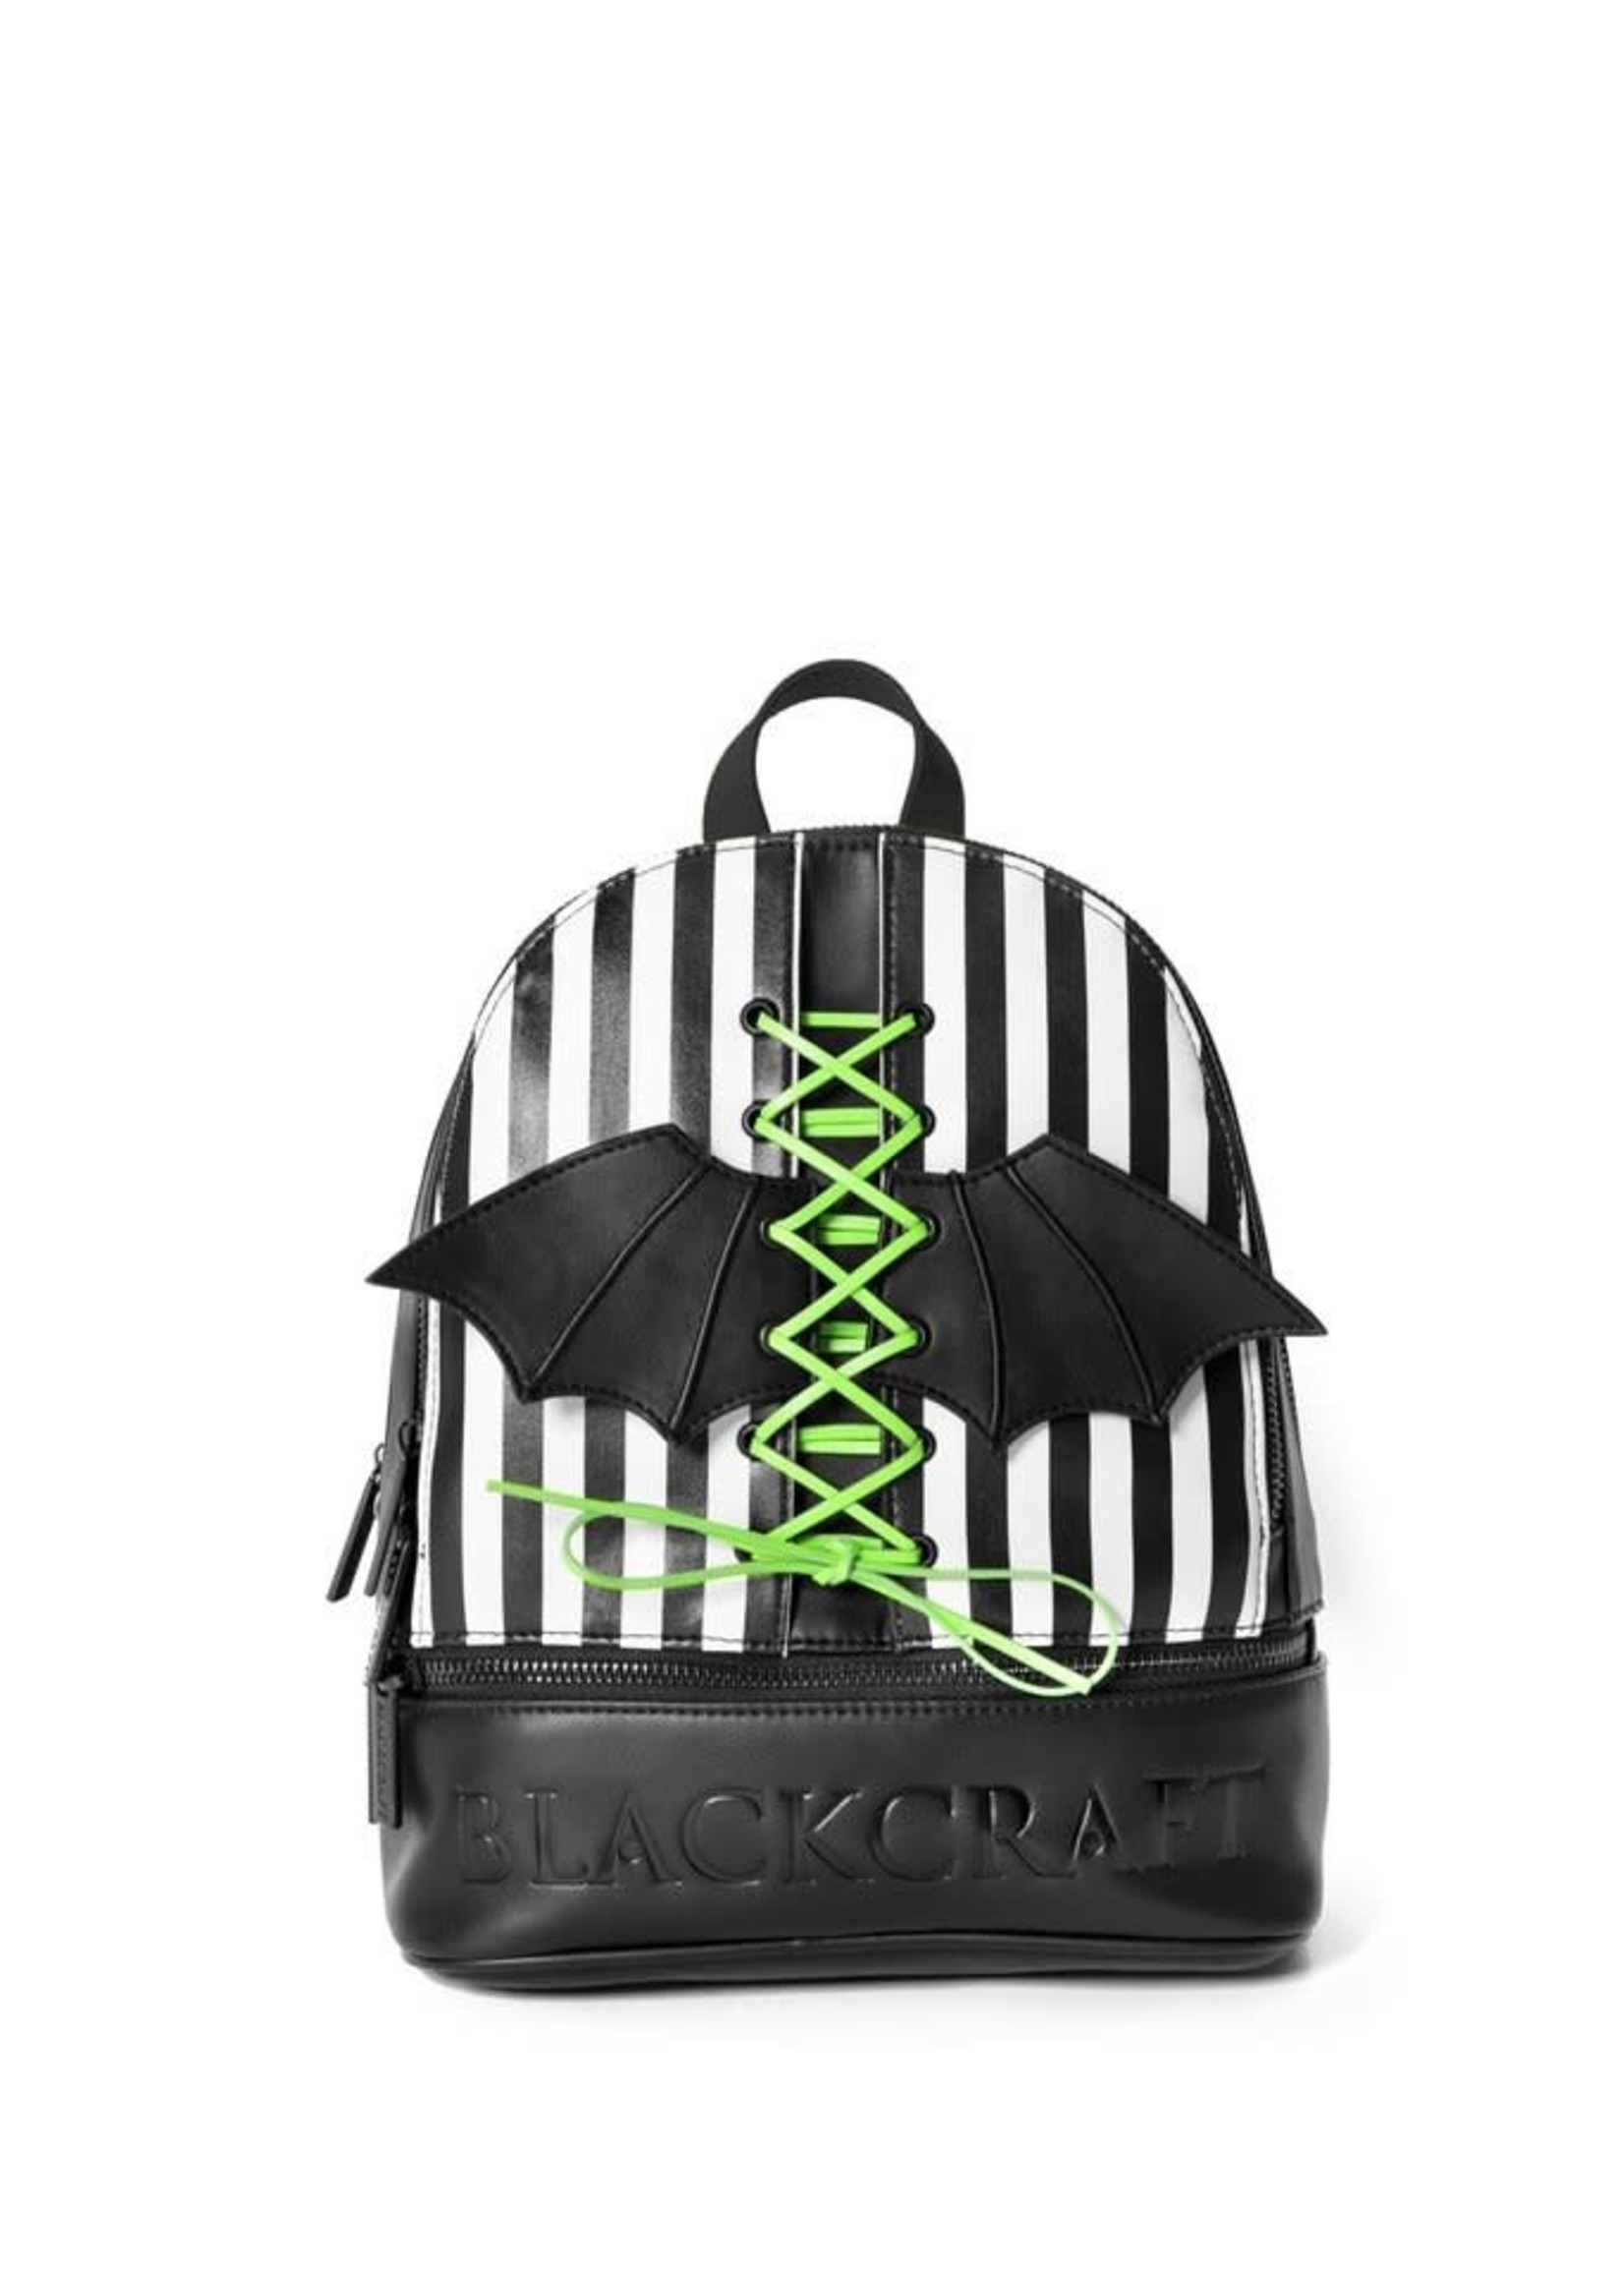 Blackcraft Cult Blackcraft Cult Bat Wing Stripe - Lace Up Backpack